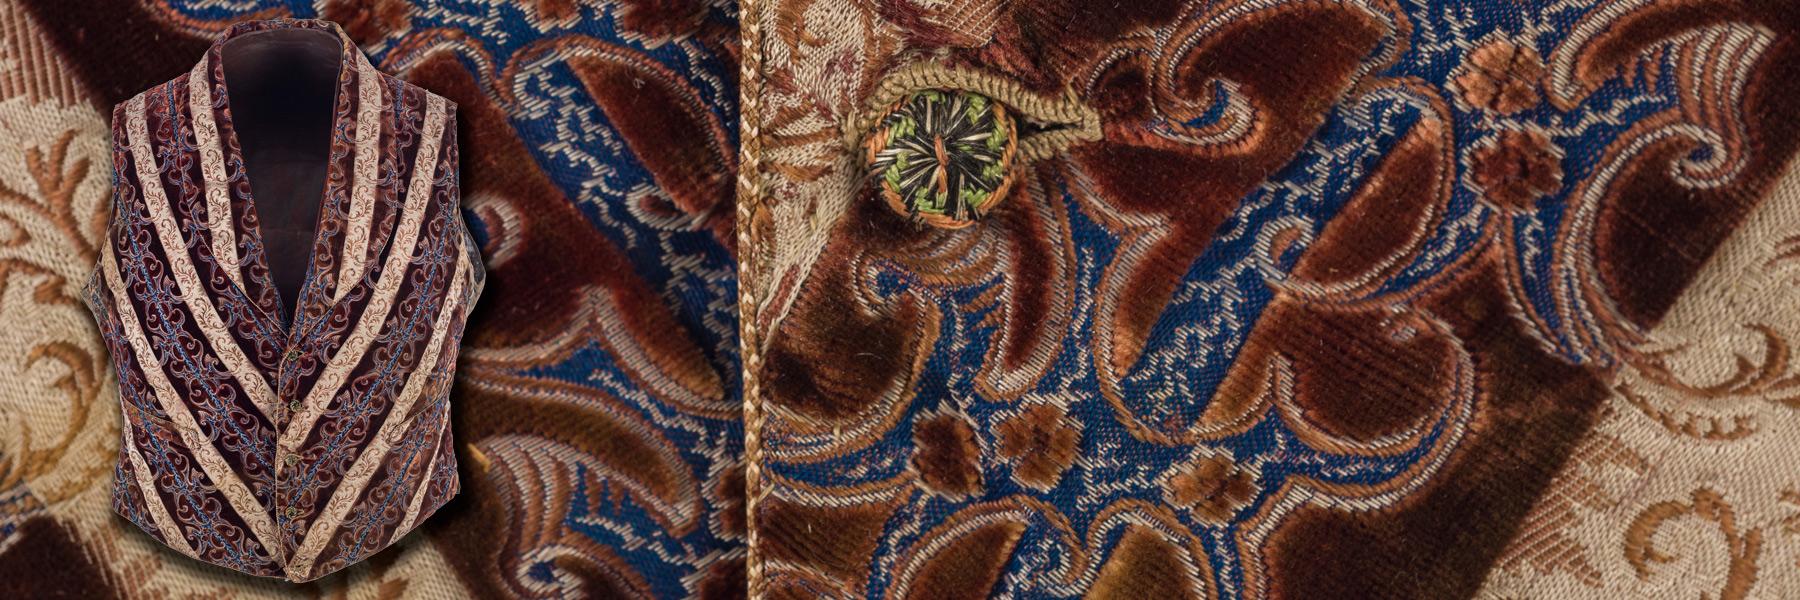 Imatge detall armilla d'home estil modernista